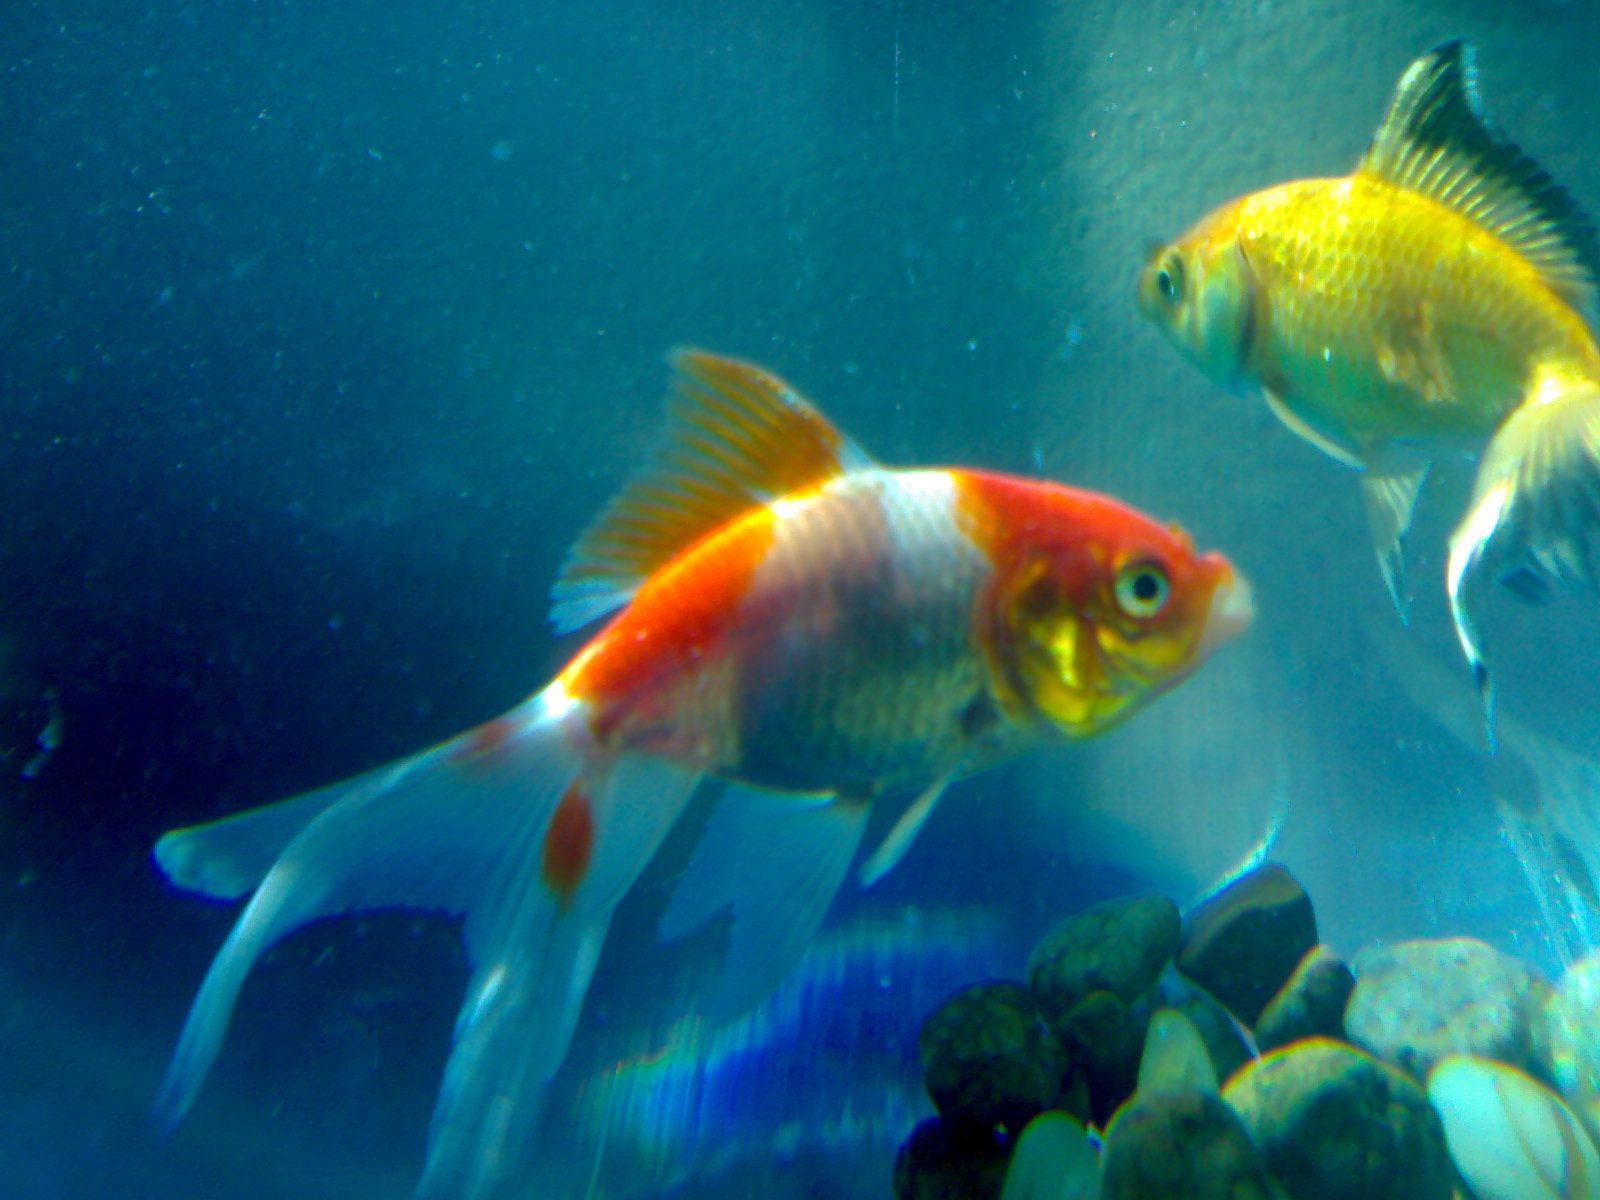 Pin By Santuccio Album On Underwater Life Beautiful Fish Fish Wallpaper Animal Wallpaper